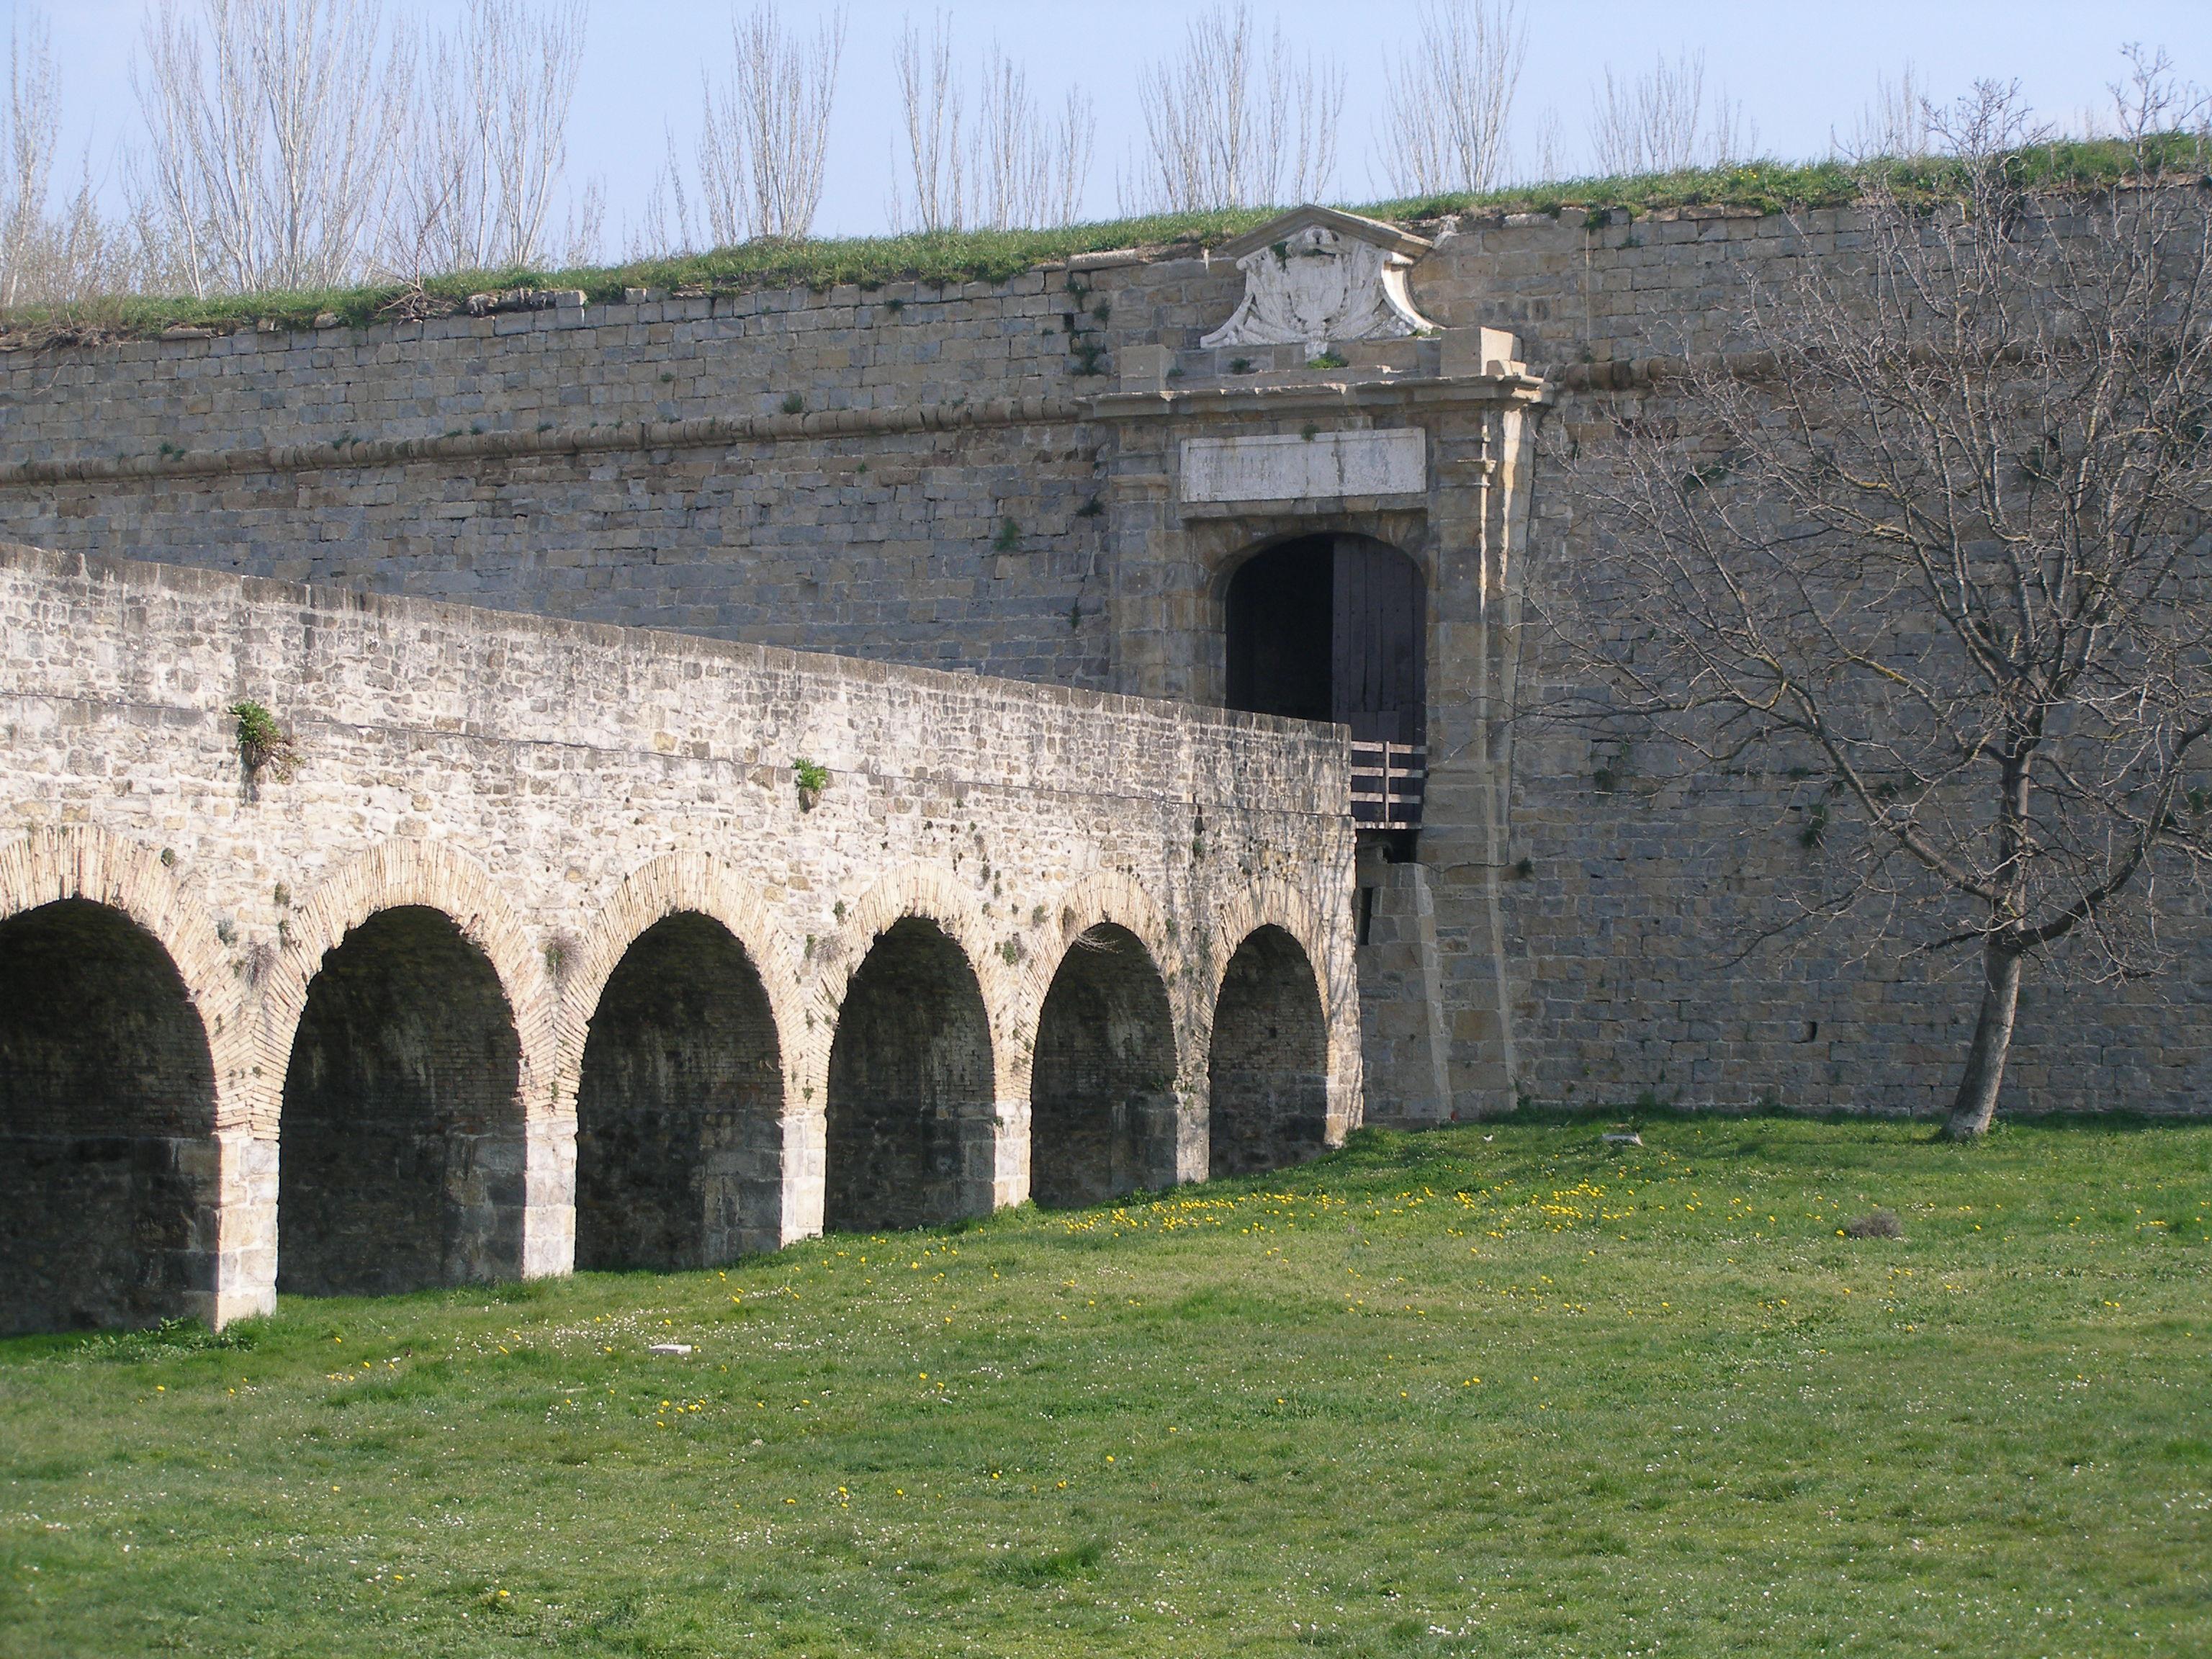 File:Ciudadela de Pamplona.JPG - Wikimedia Commons